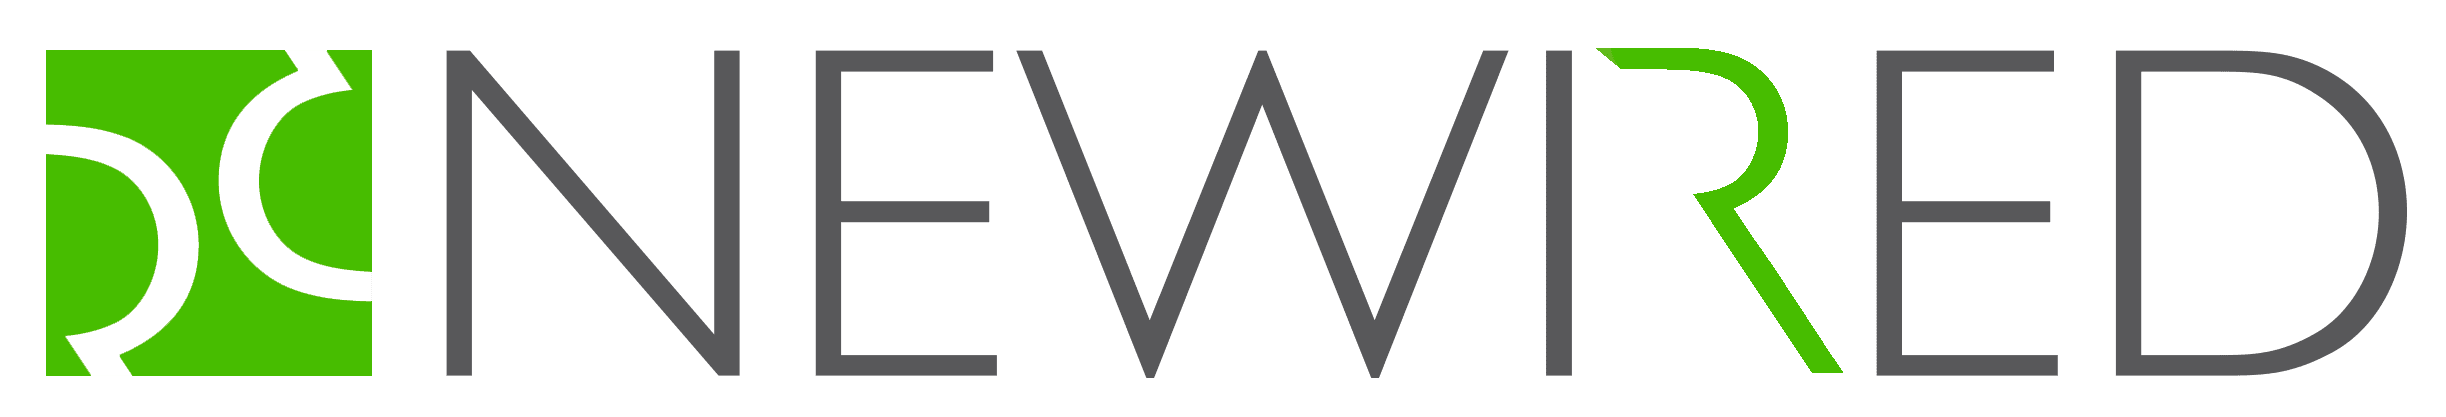 Marchio&Logo3.0